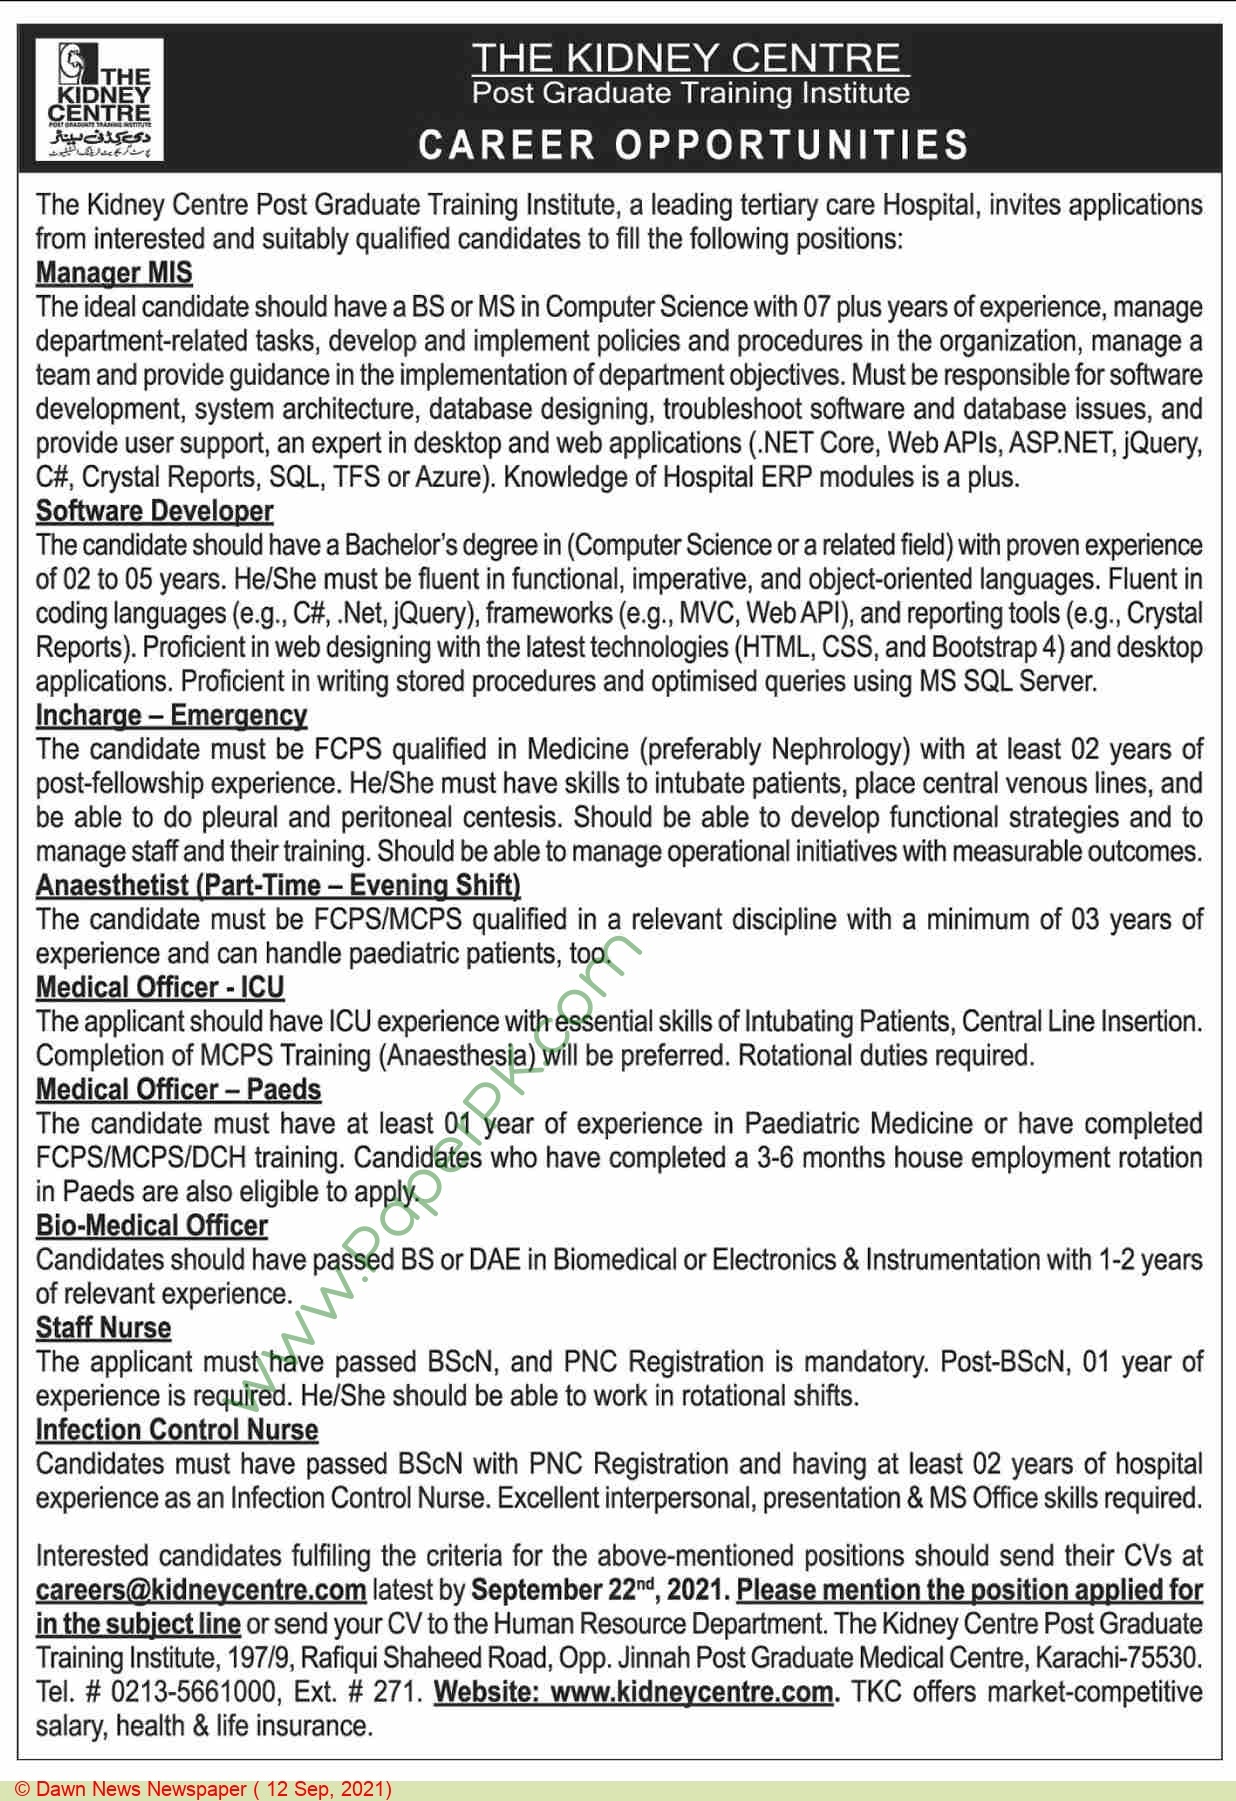 The Kidney Centre Postgraduate Training Institute jobs newspaper ad for Anaesthetist in Karachi on 2021-09-12